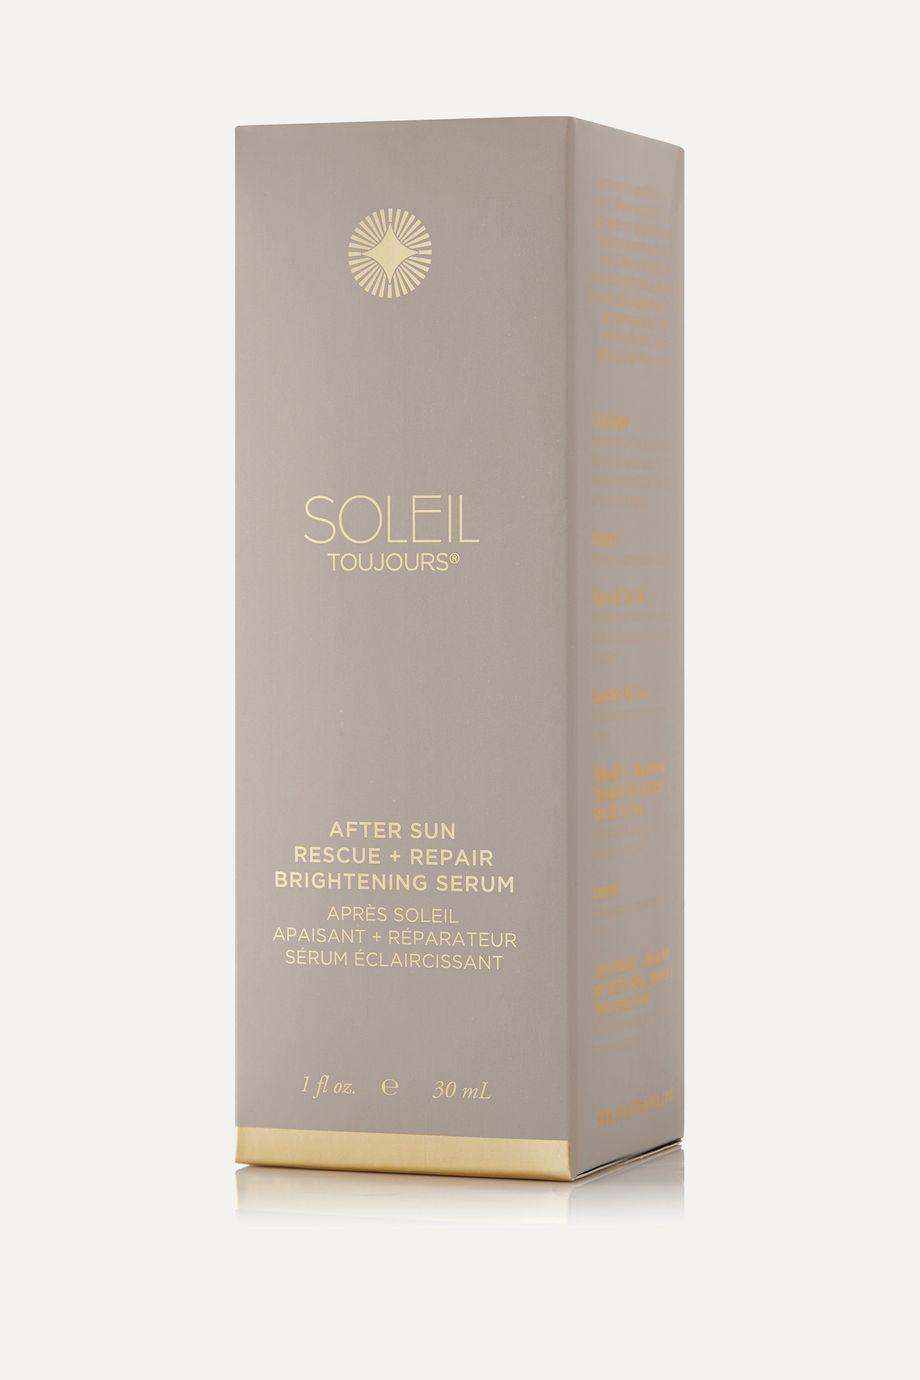 Soleil Toujours + NET SUSTAIN After Sun Rescue + Repair Brightening Serum, 30ml